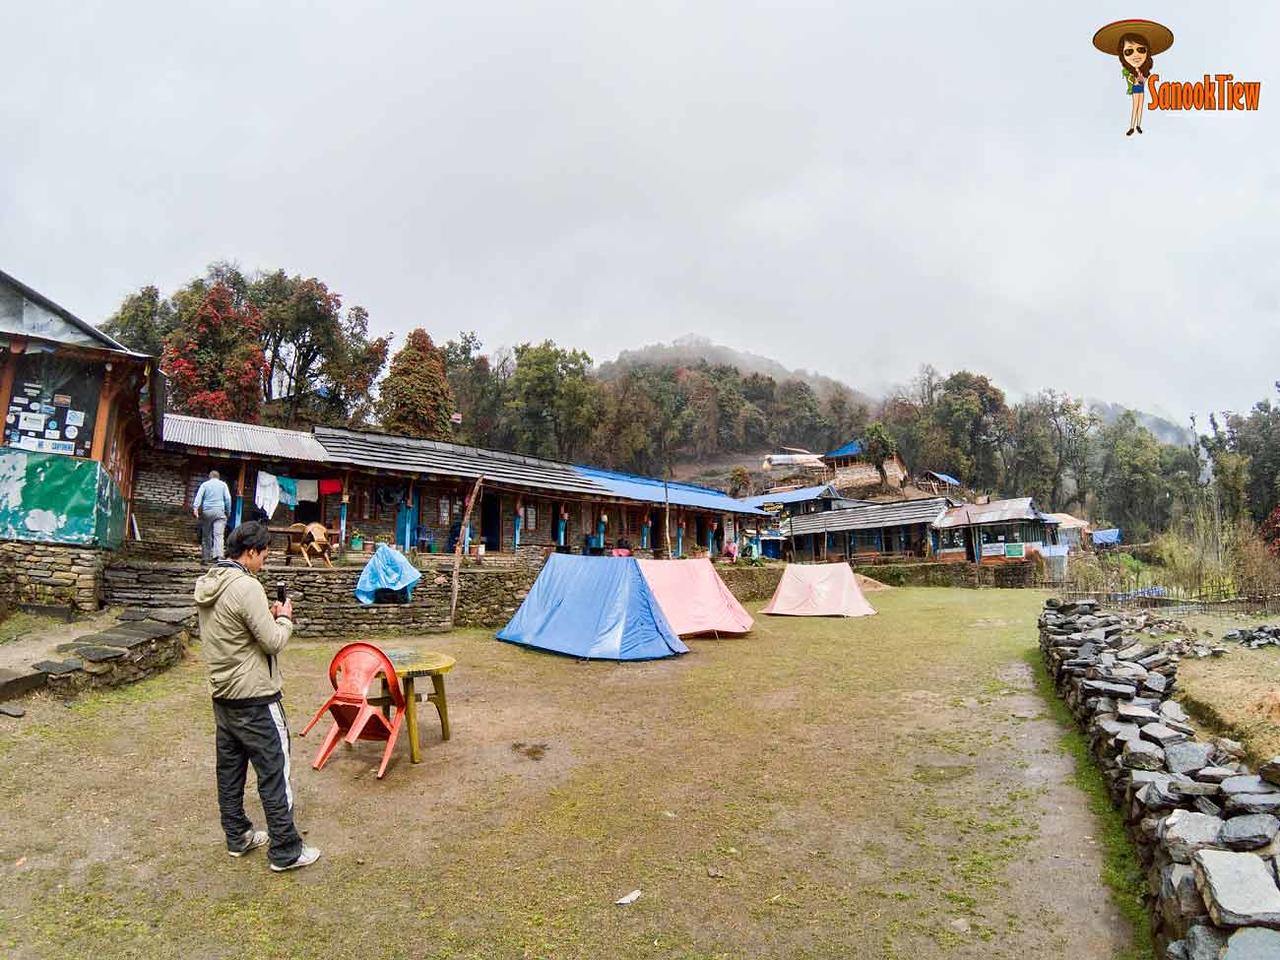 Mardi Himal trekking Nepal เทรคกิ้ง มาดิฮิมาล เนปาล Forest Camp